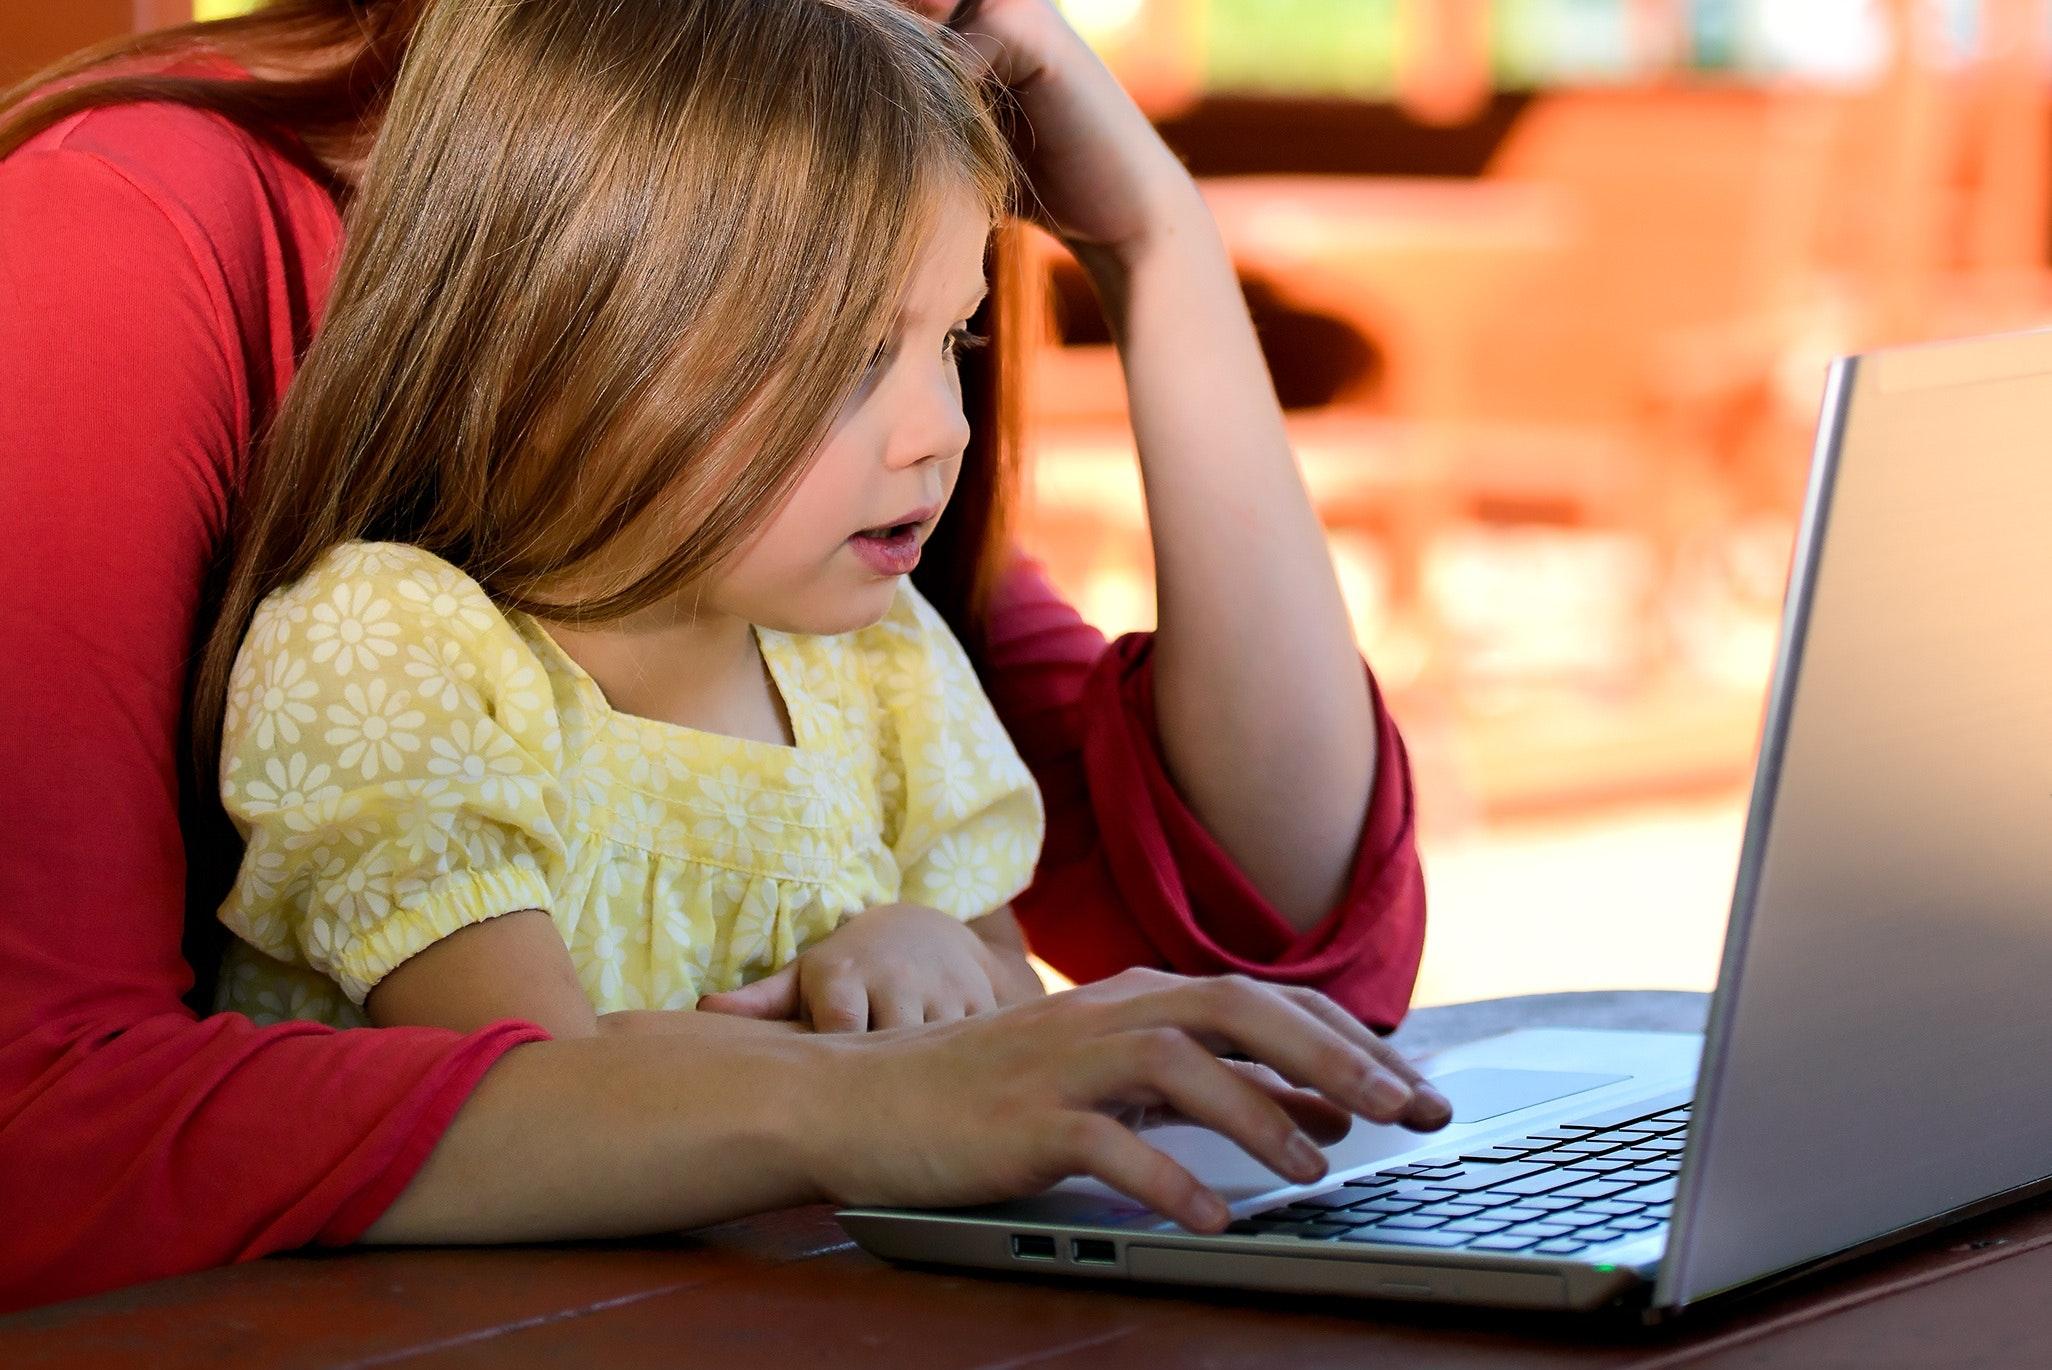 child-computer-cute-159848-1